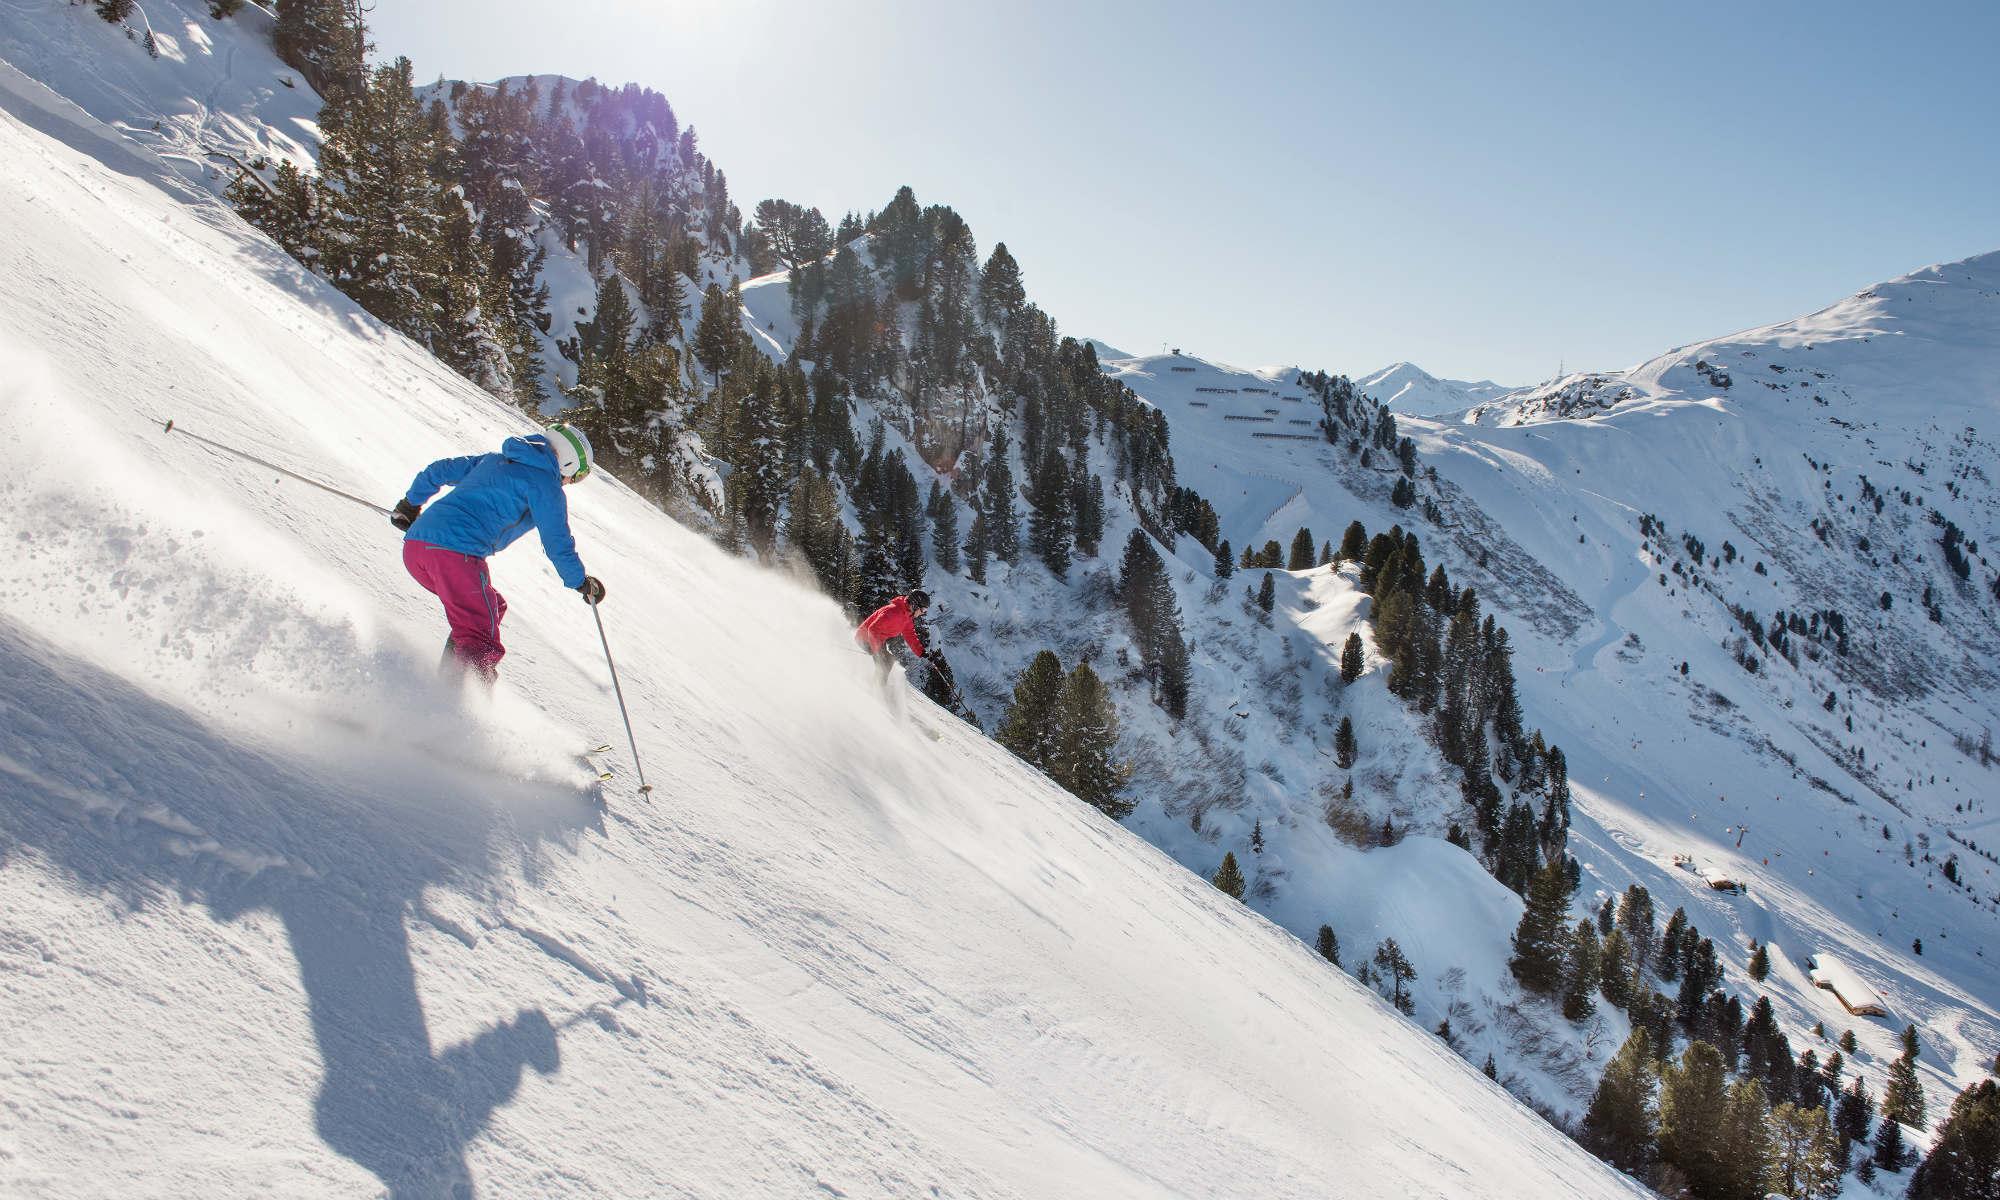 An experienced skier on the Harakiri run in Mayrhofen.